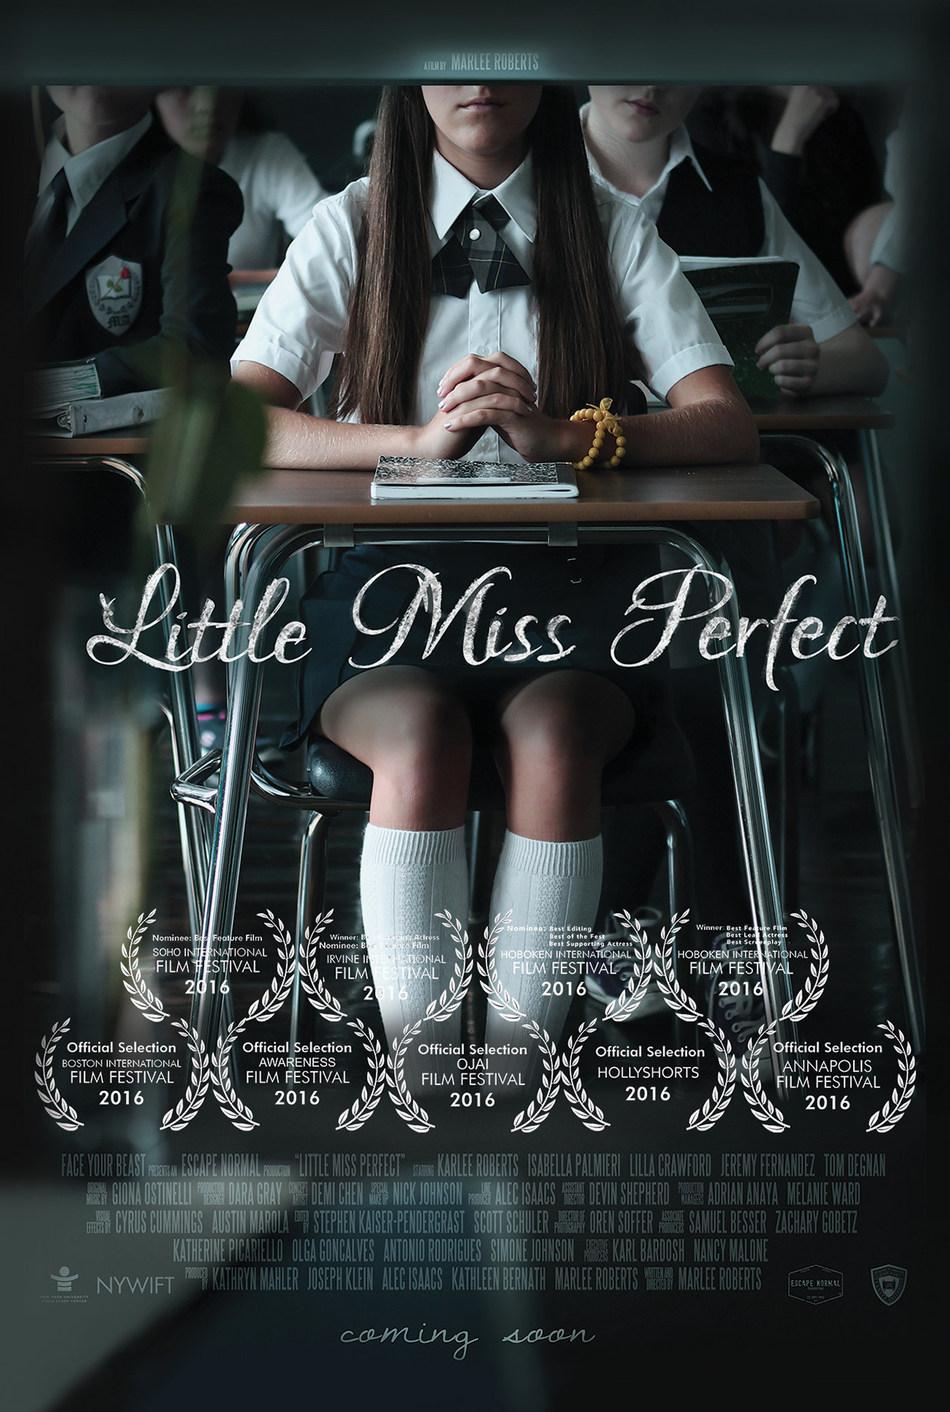 Little Miss Perfect Screening April 27 in Dallas